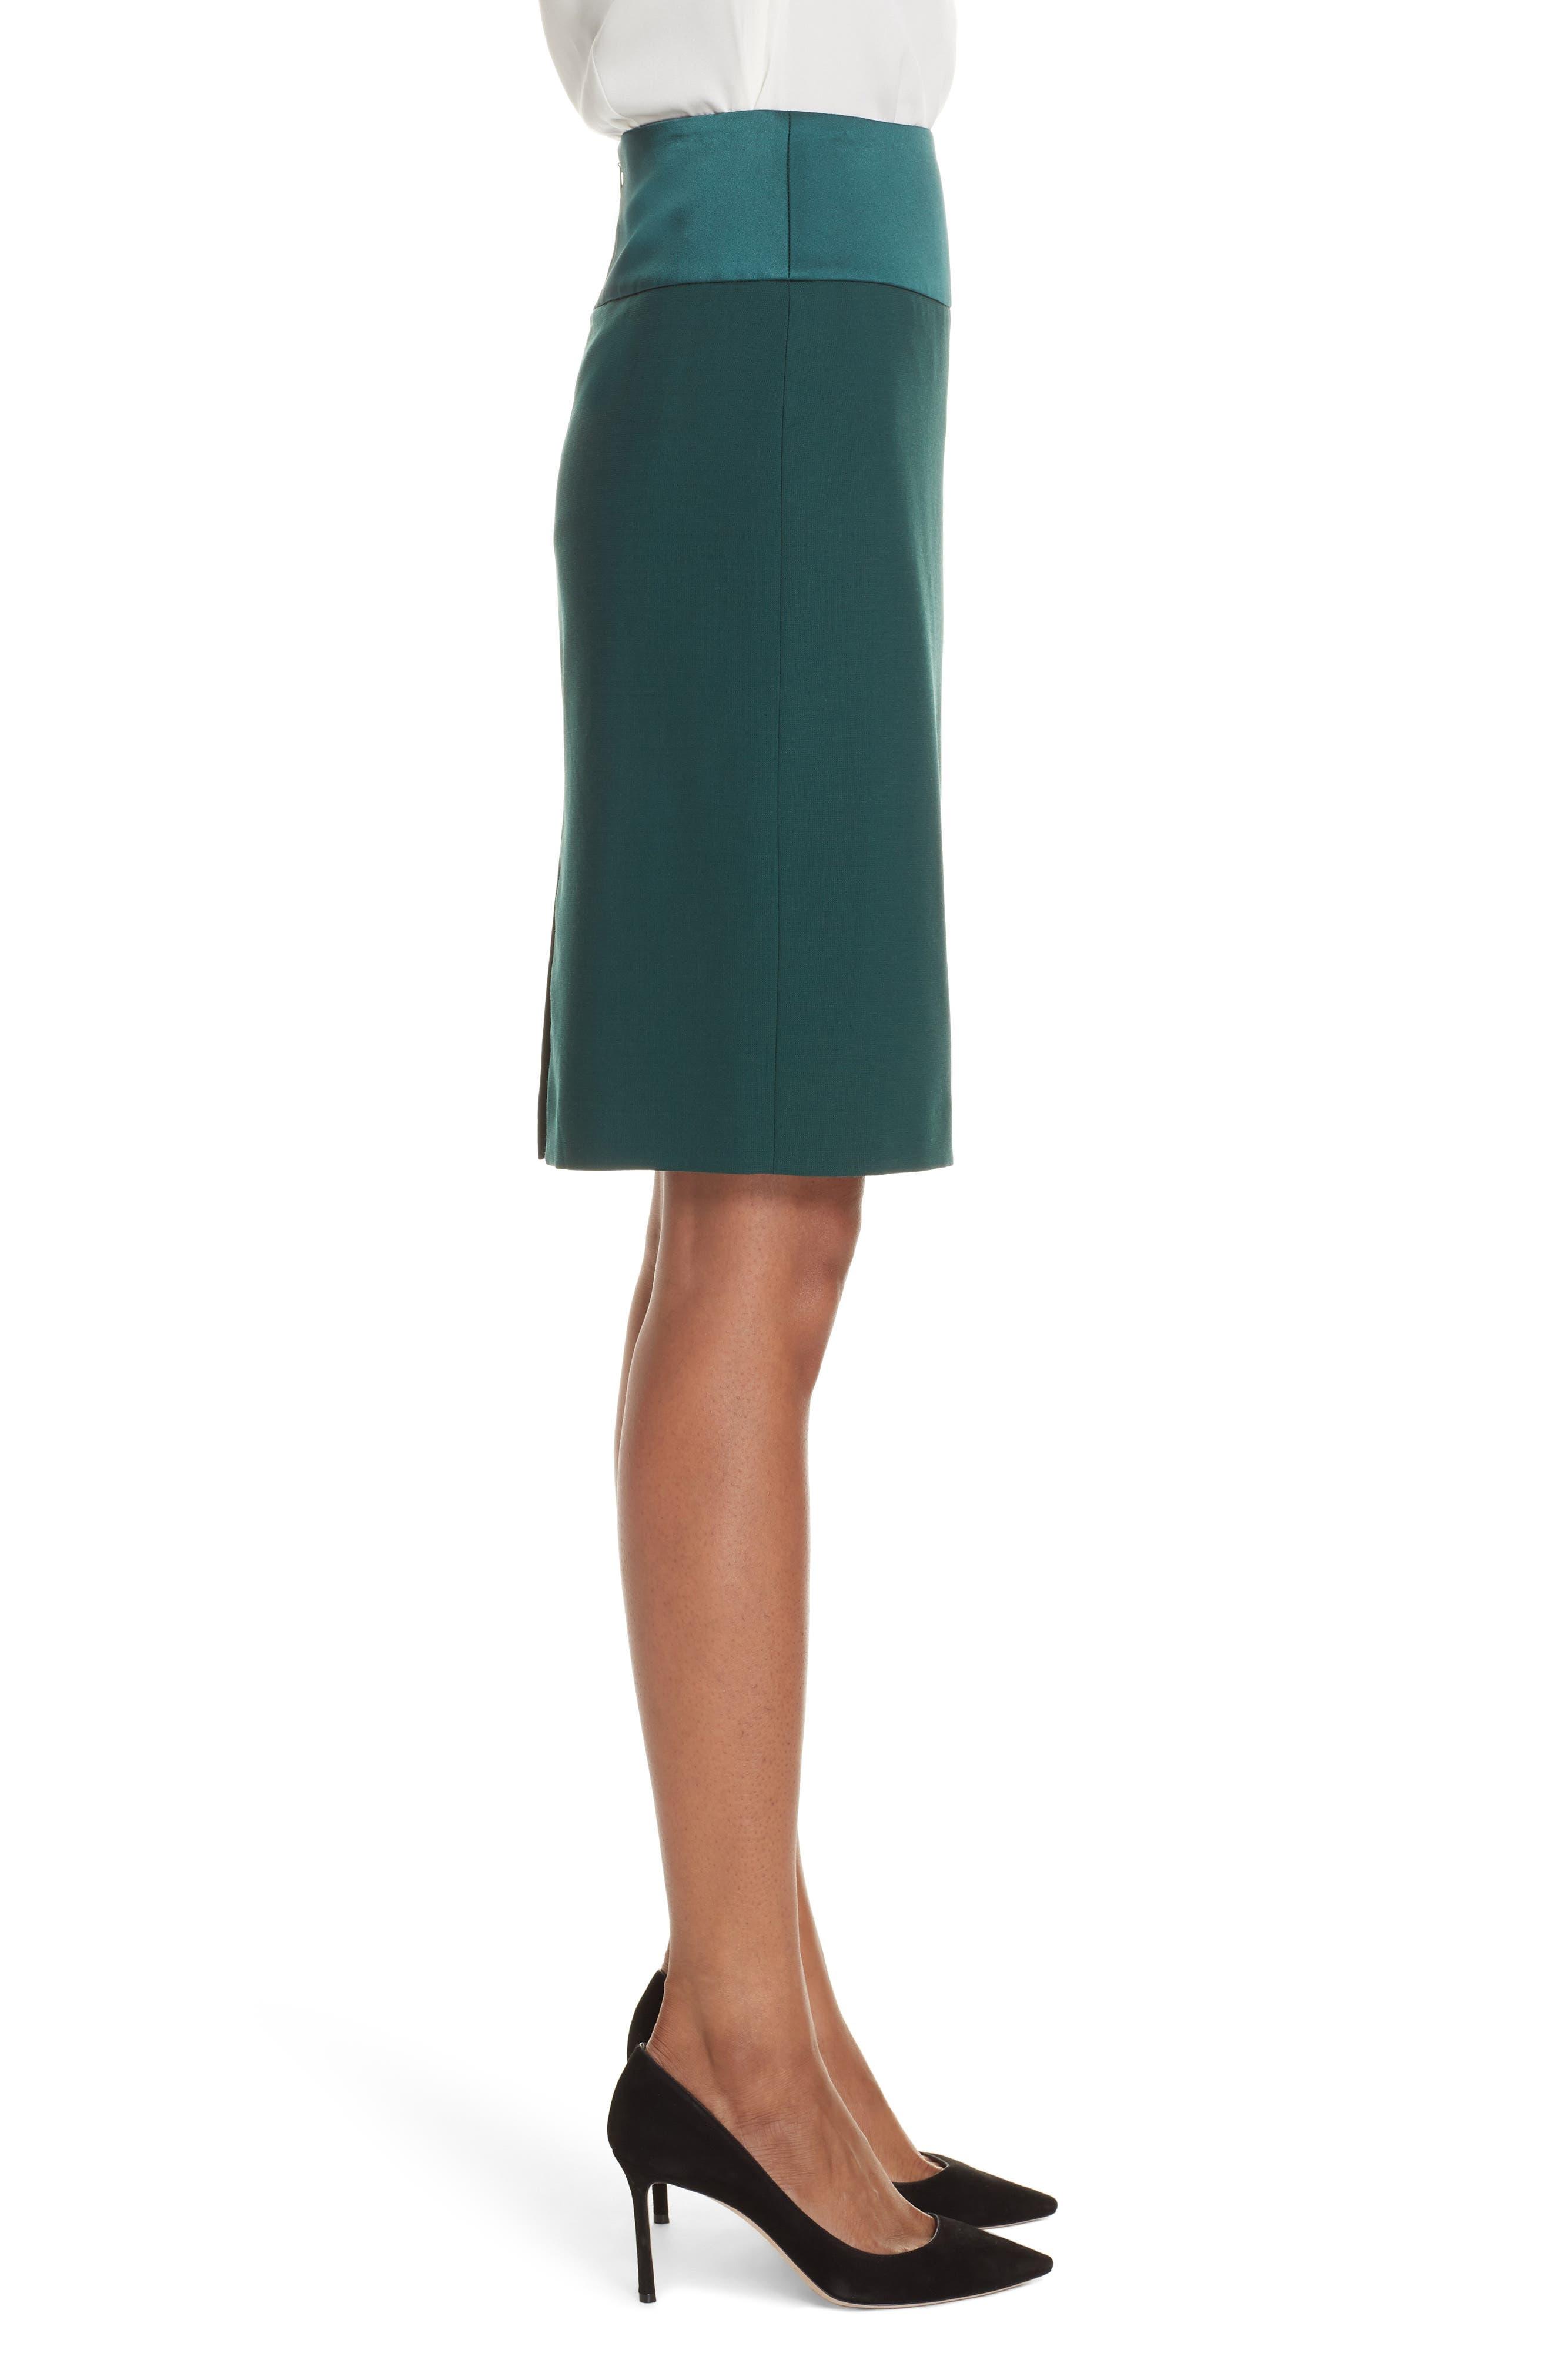 Vanufa Stretch Wool Suit Skirt,                             Alternate thumbnail 3, color,                             PINE GREEN